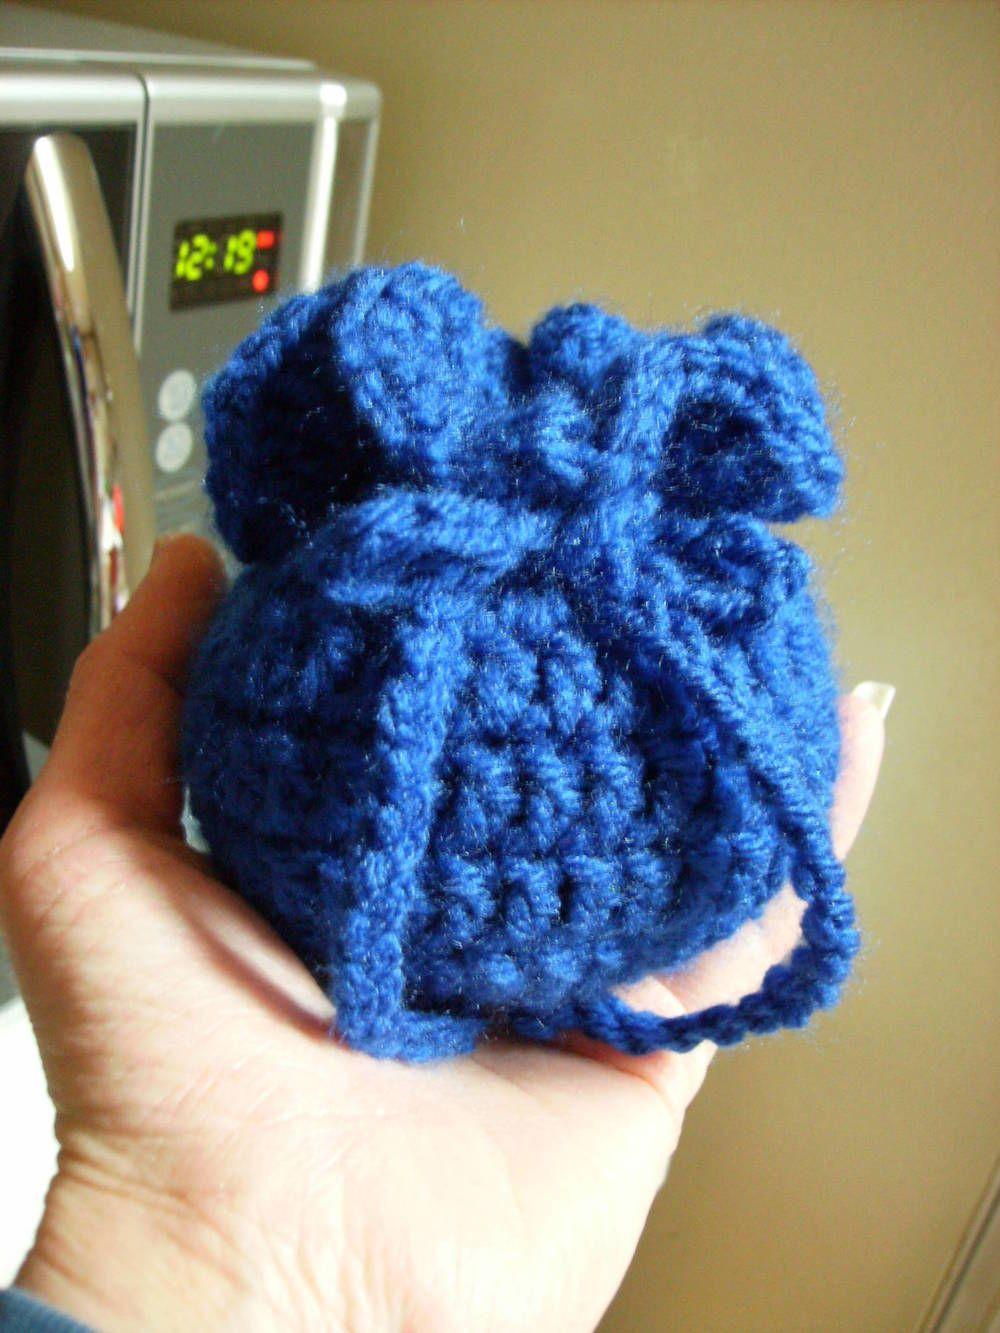 Blueberry bag crochet pattern allfreecrochet crochet if it looks like blueberry and feels like a blueberry its probably a blueberry bag this undeniably adorable free crochet bag pattern makes a great gift bankloansurffo Gallery